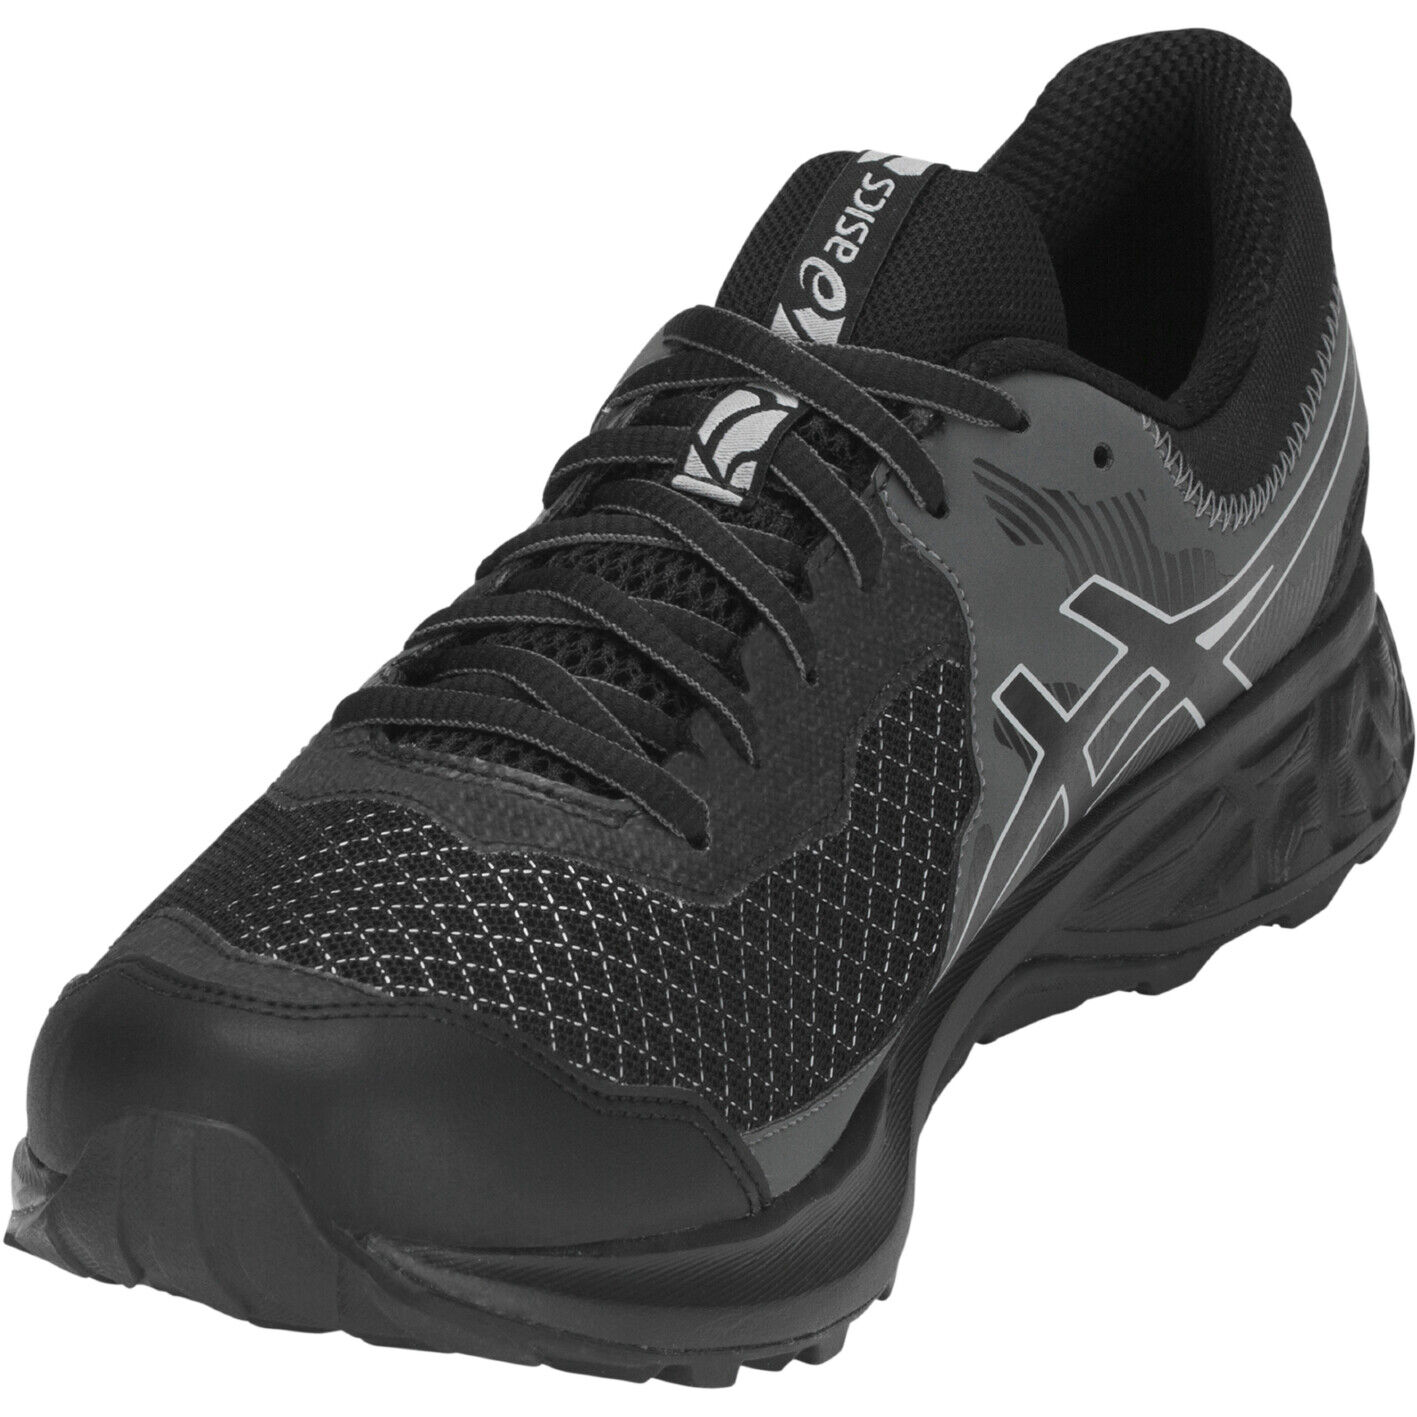 asics Gel Sonoma 4 G TX Schuhe Herren blackstone grey